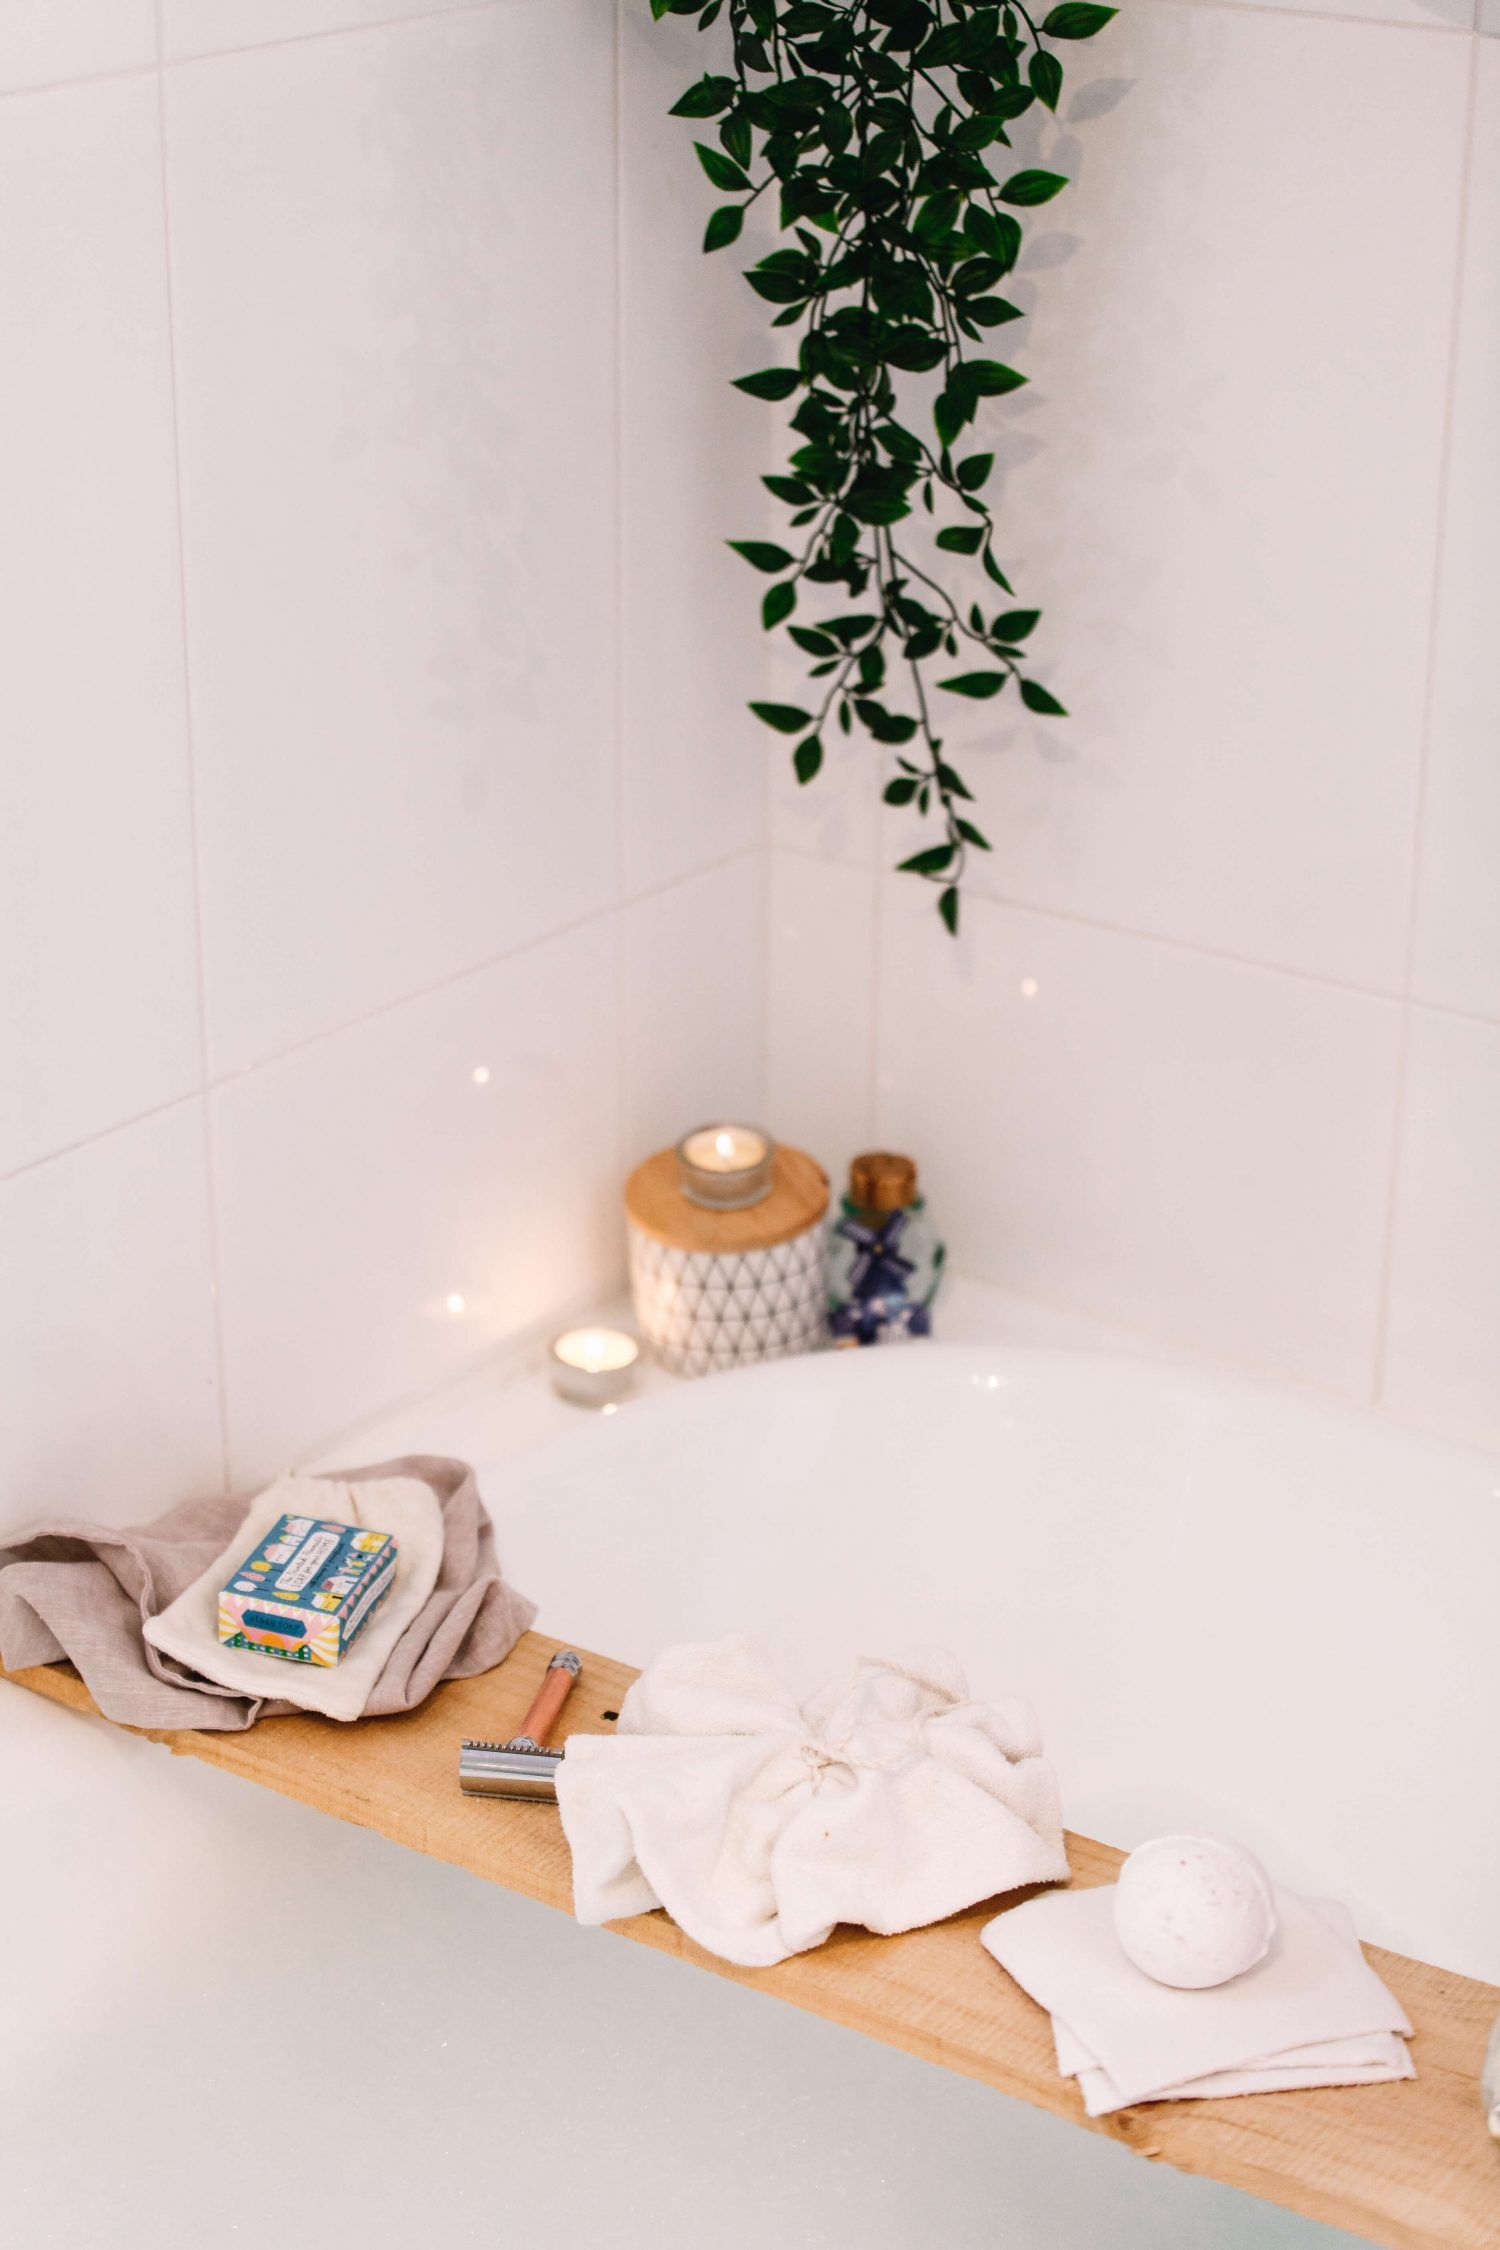 Hemp Shower Poufs Shower puff, Shower pouf, Plastic free